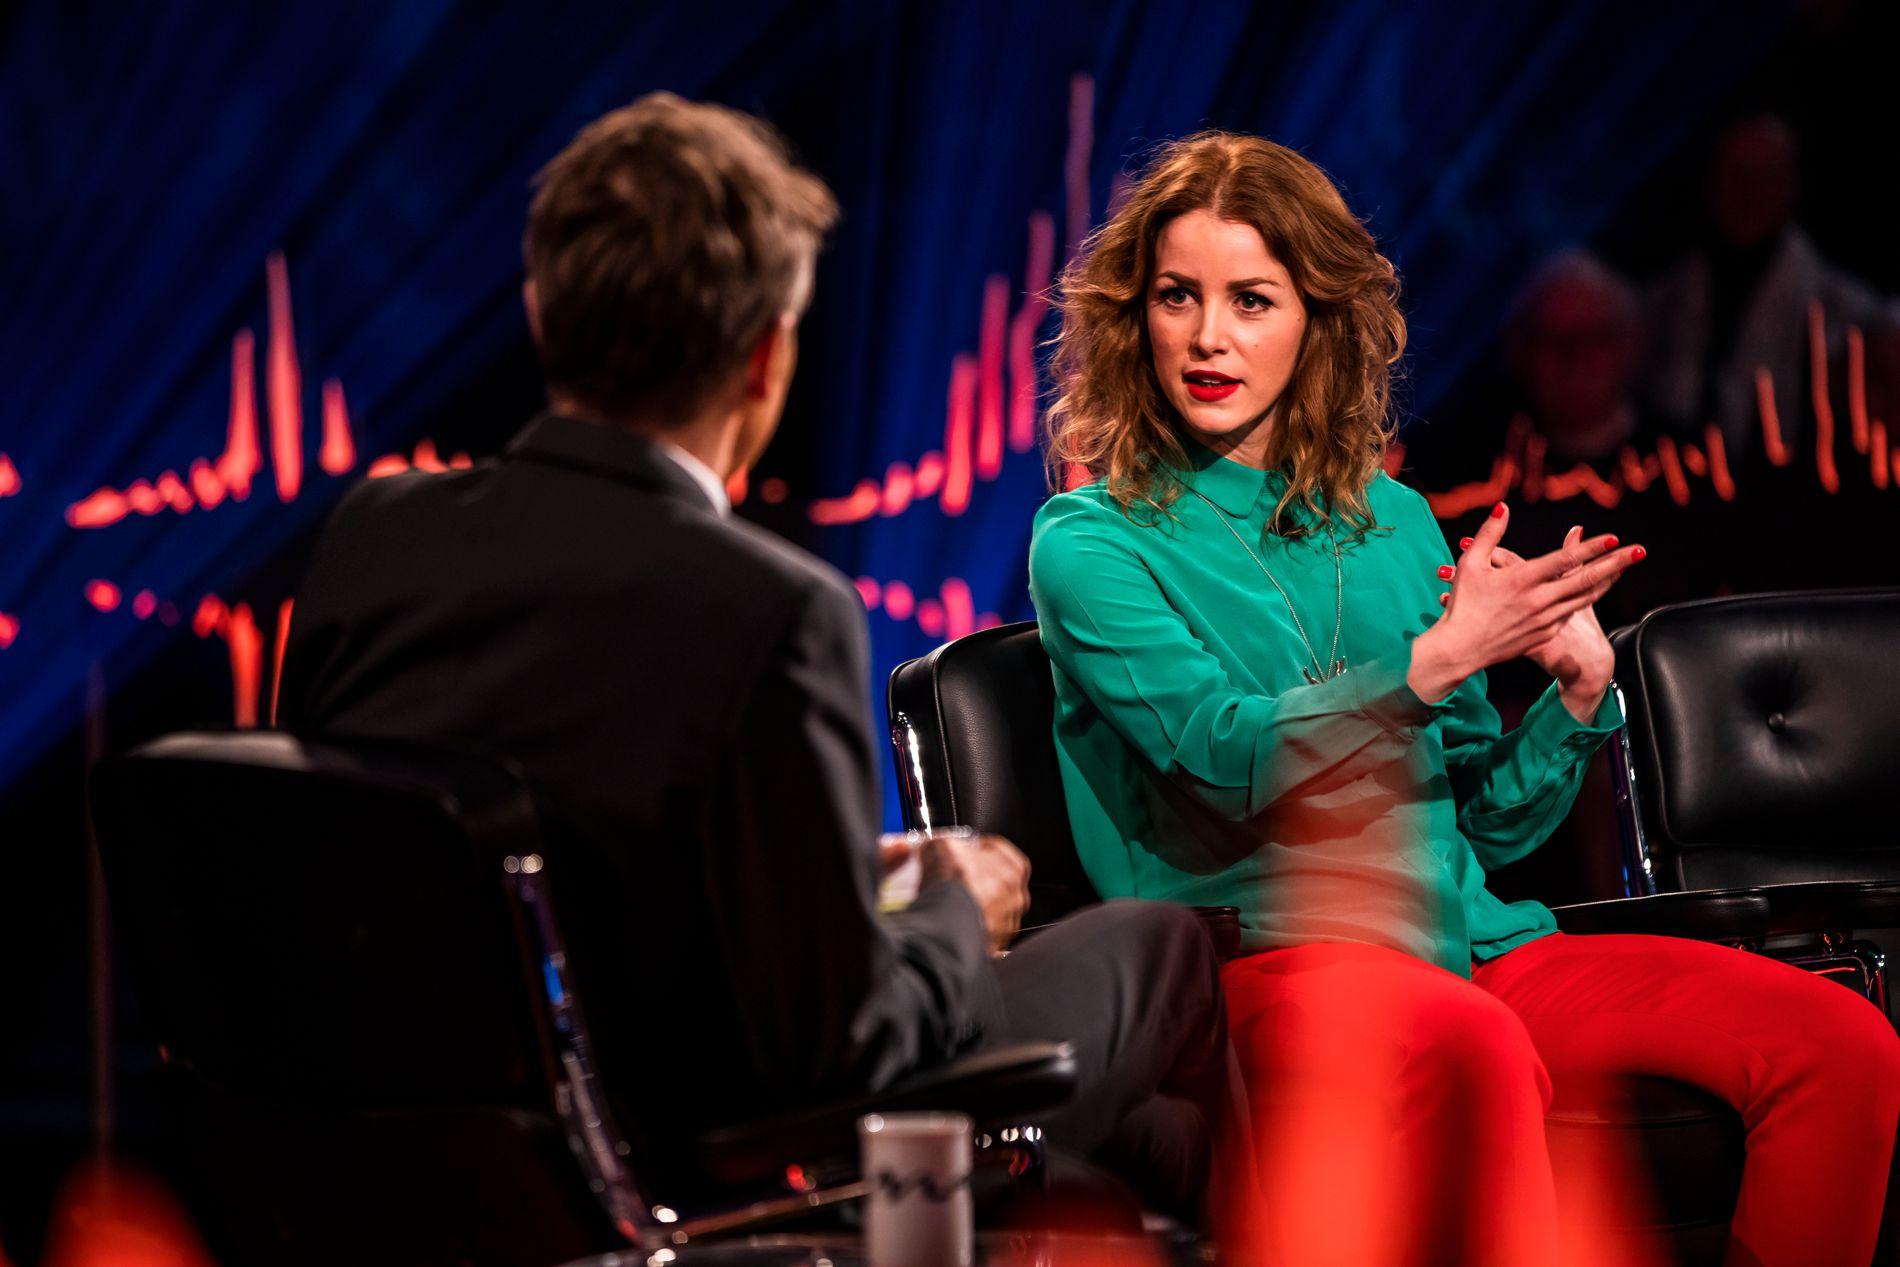 MISFORNØYD: Komiker, regissør, produsent og skuespiller Marie Agerhäll følte at hun kun ble spurt om ektemannen.